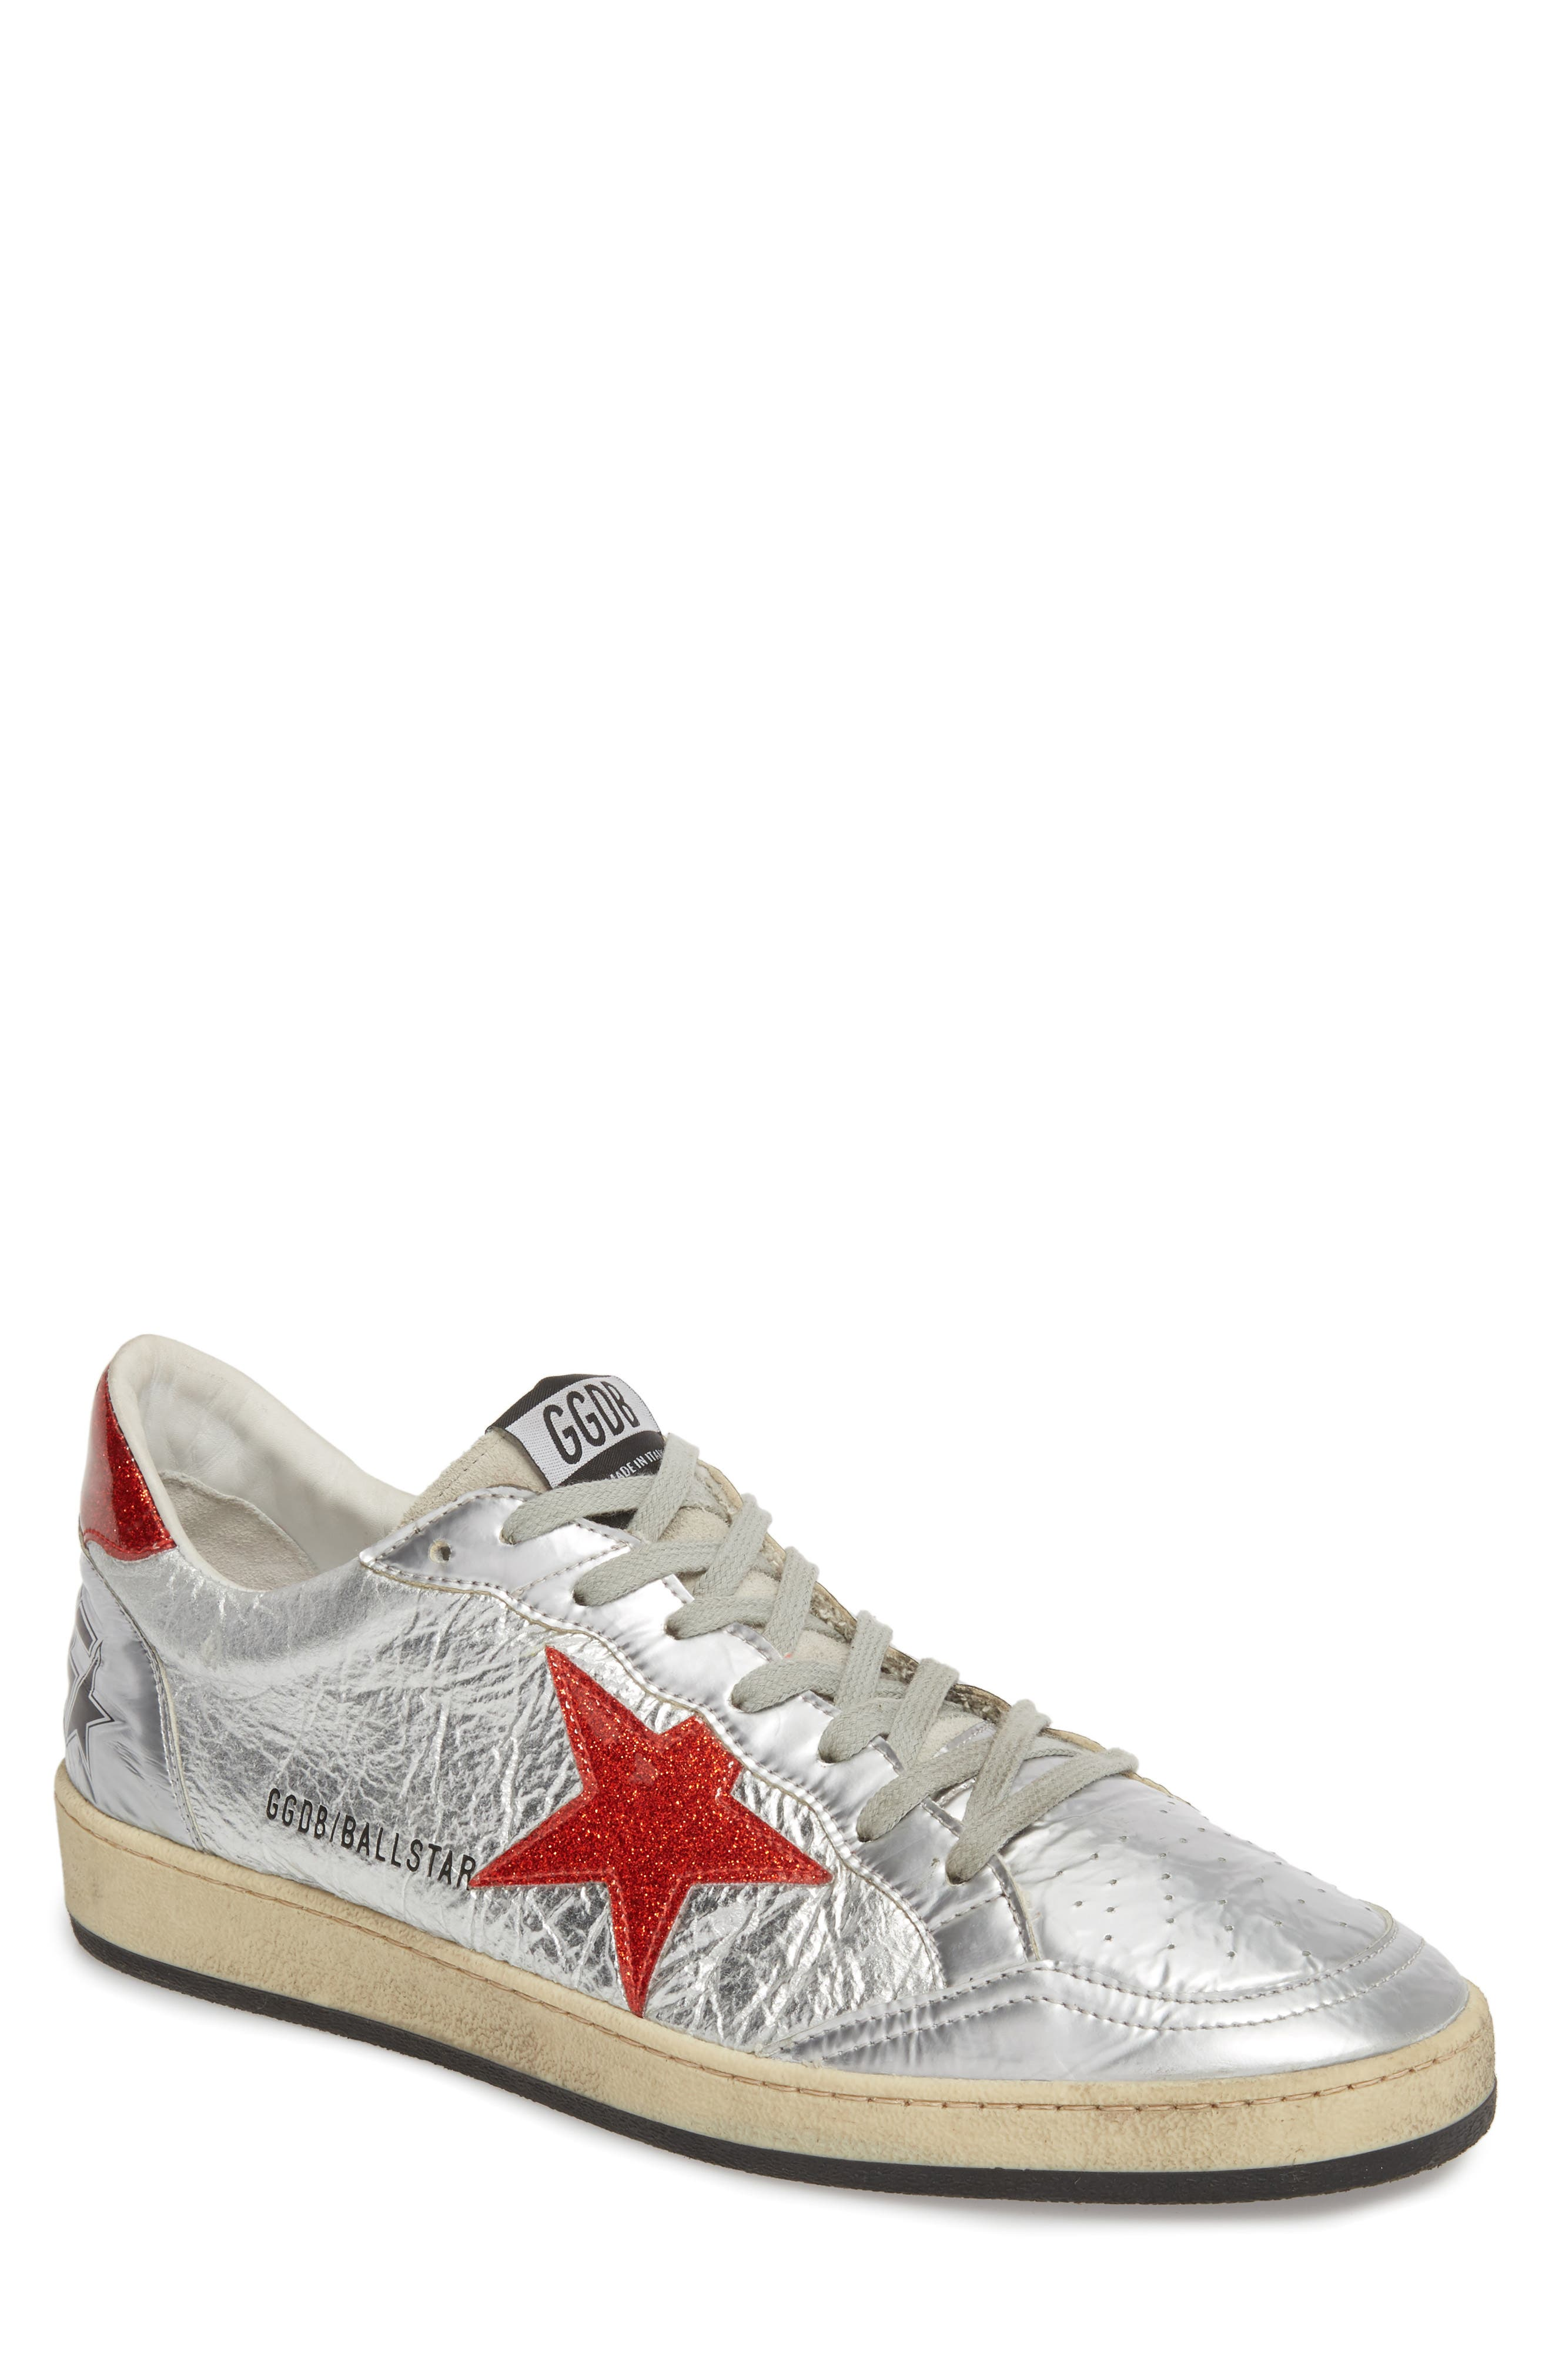 B-Ball Star Sneaker,                             Main thumbnail 1, color,                             SILVER-RED GLITTER- STAR DANCE